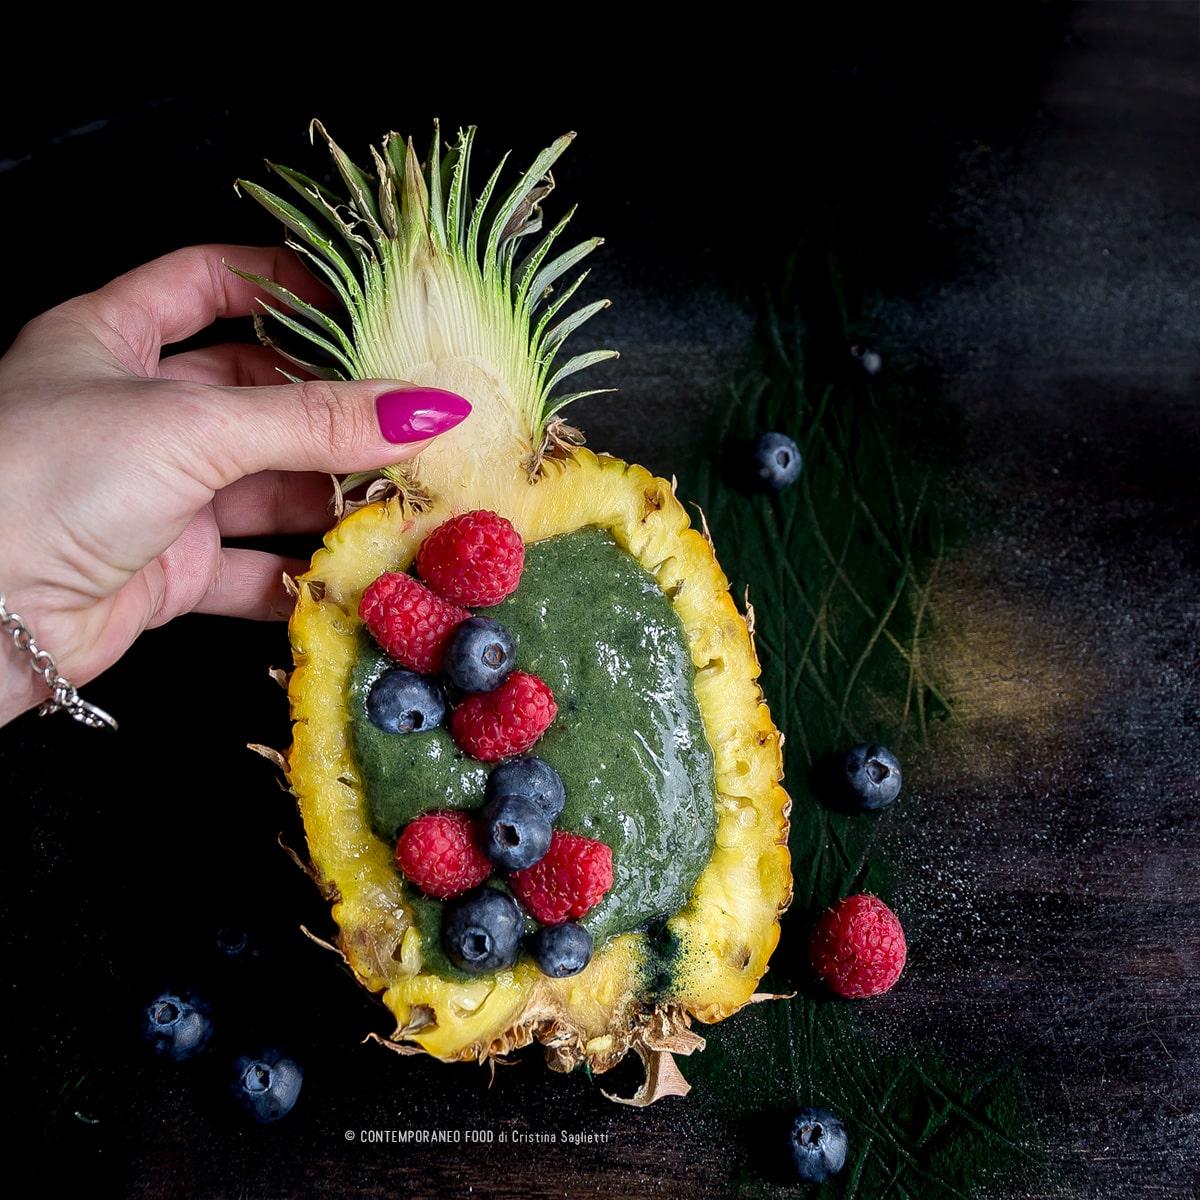 smoothie-bowl-spirulina-ananas-banana-superfood-2018-ricetta-facile-contemporaneo-food